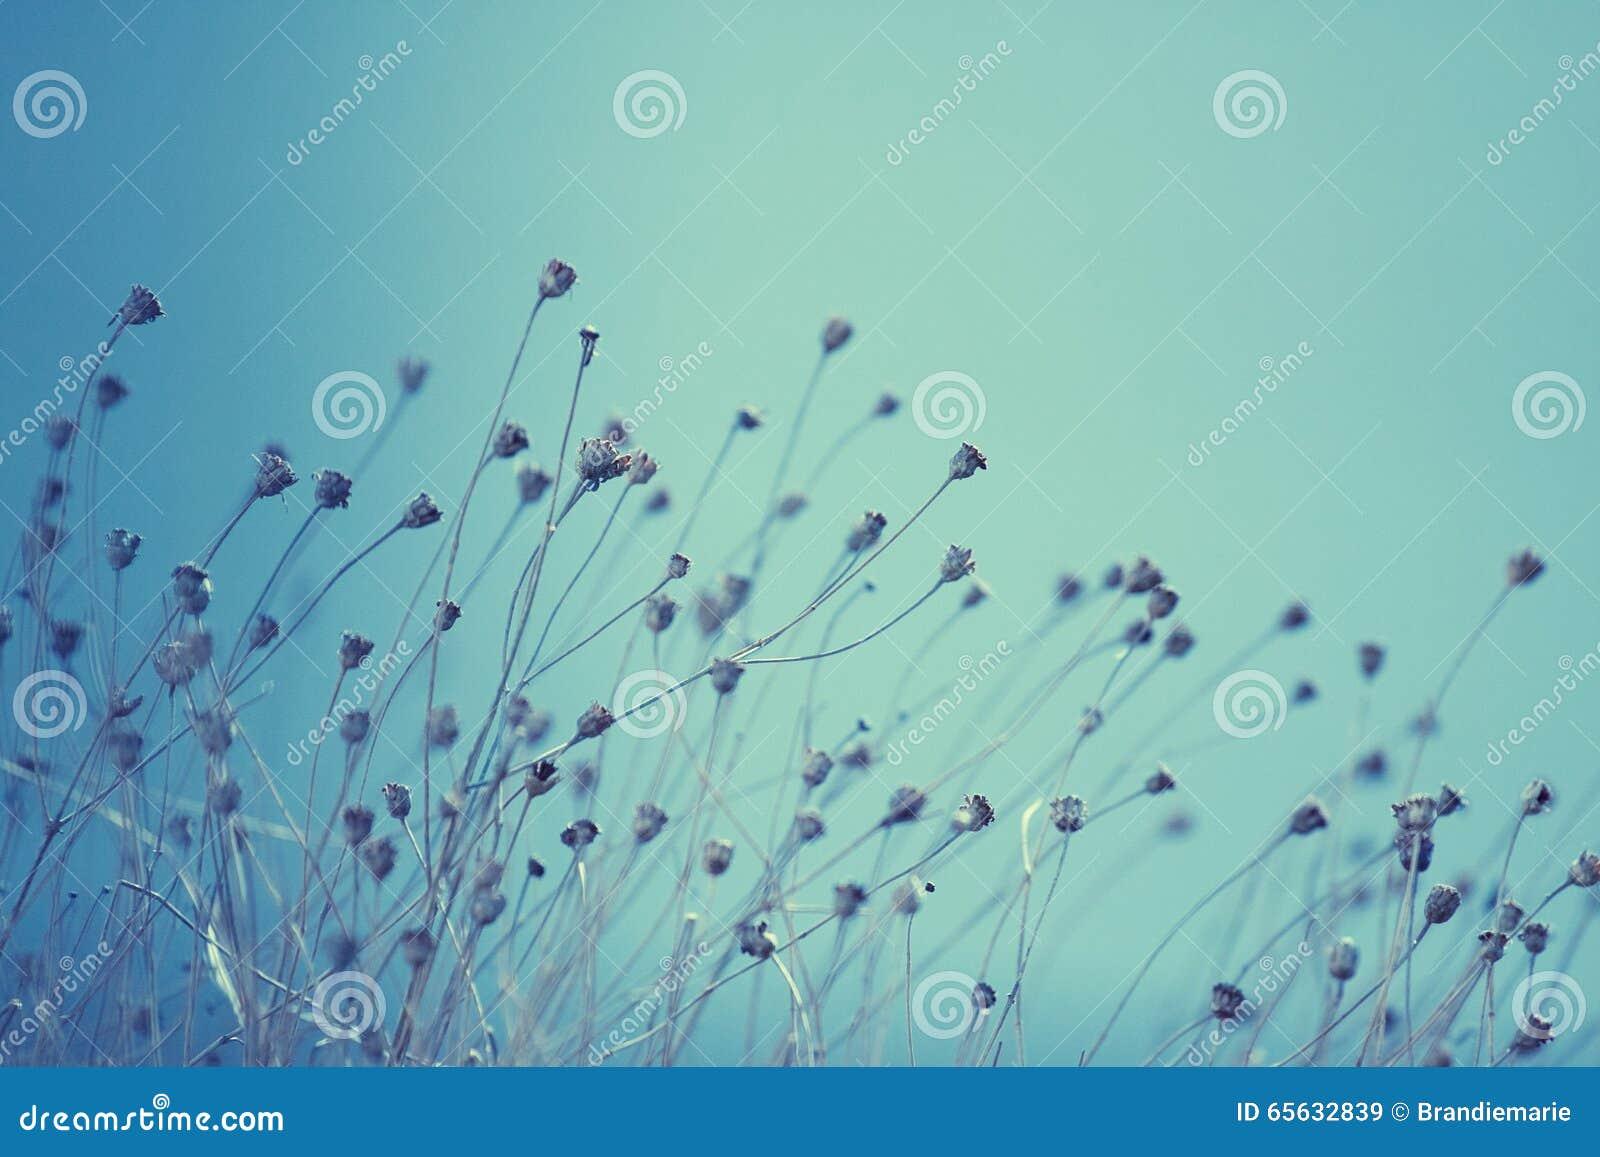 Mauvaises herbes au printemps